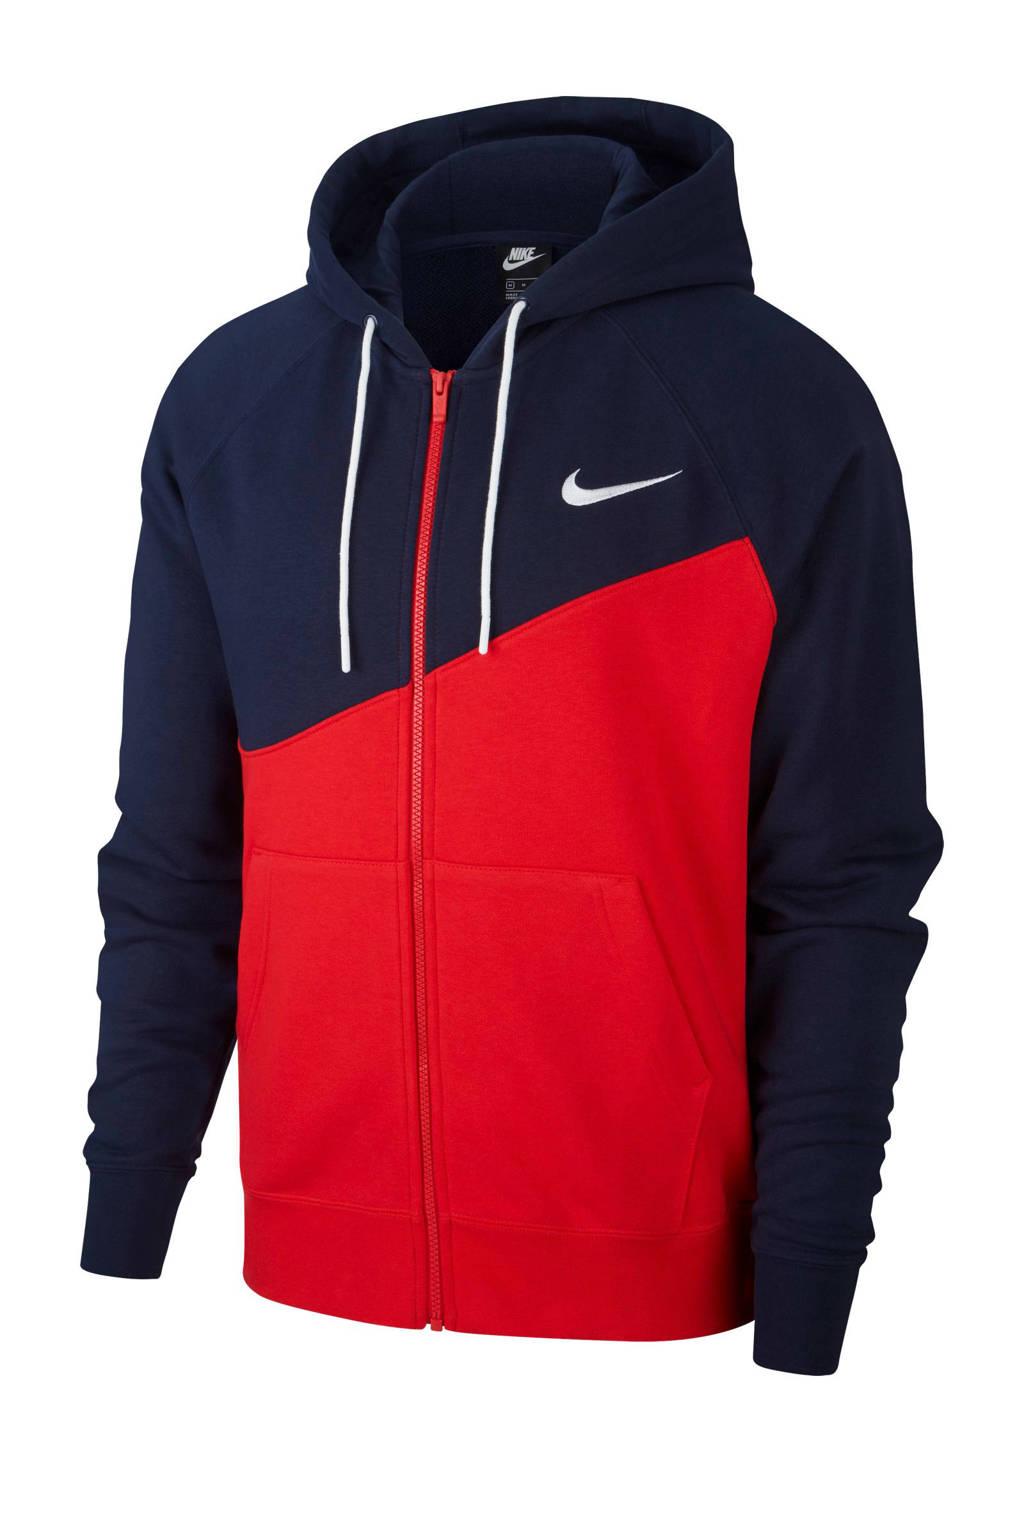 Nike   vest donkerblauw/rood, Donkerblauw/rood